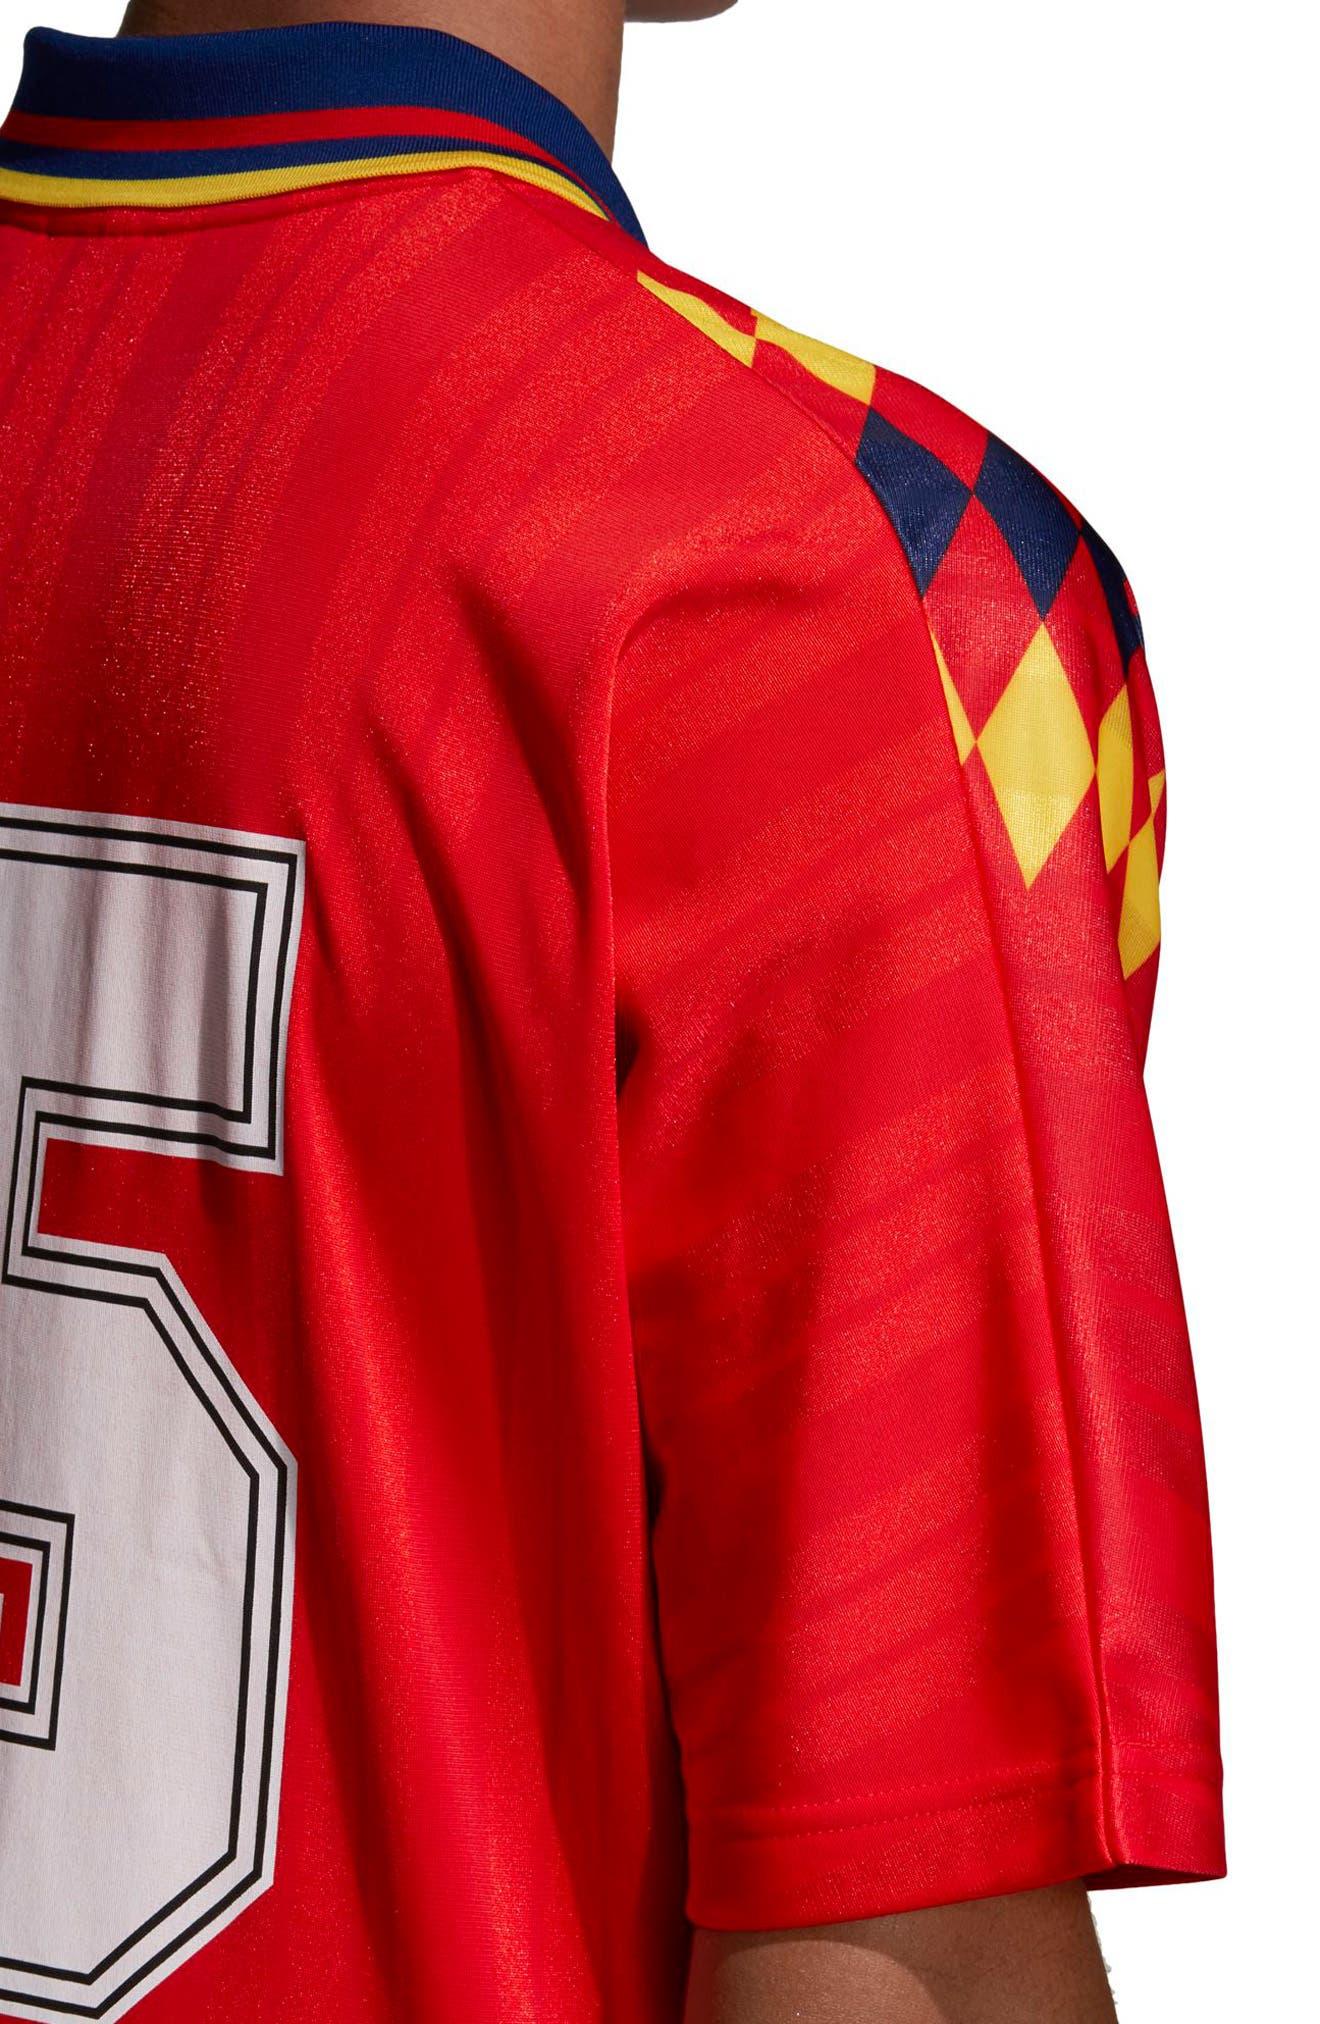 adidas Original Spain 1994 Soccer Jersey,                             Alternate thumbnail 4, color,                             625